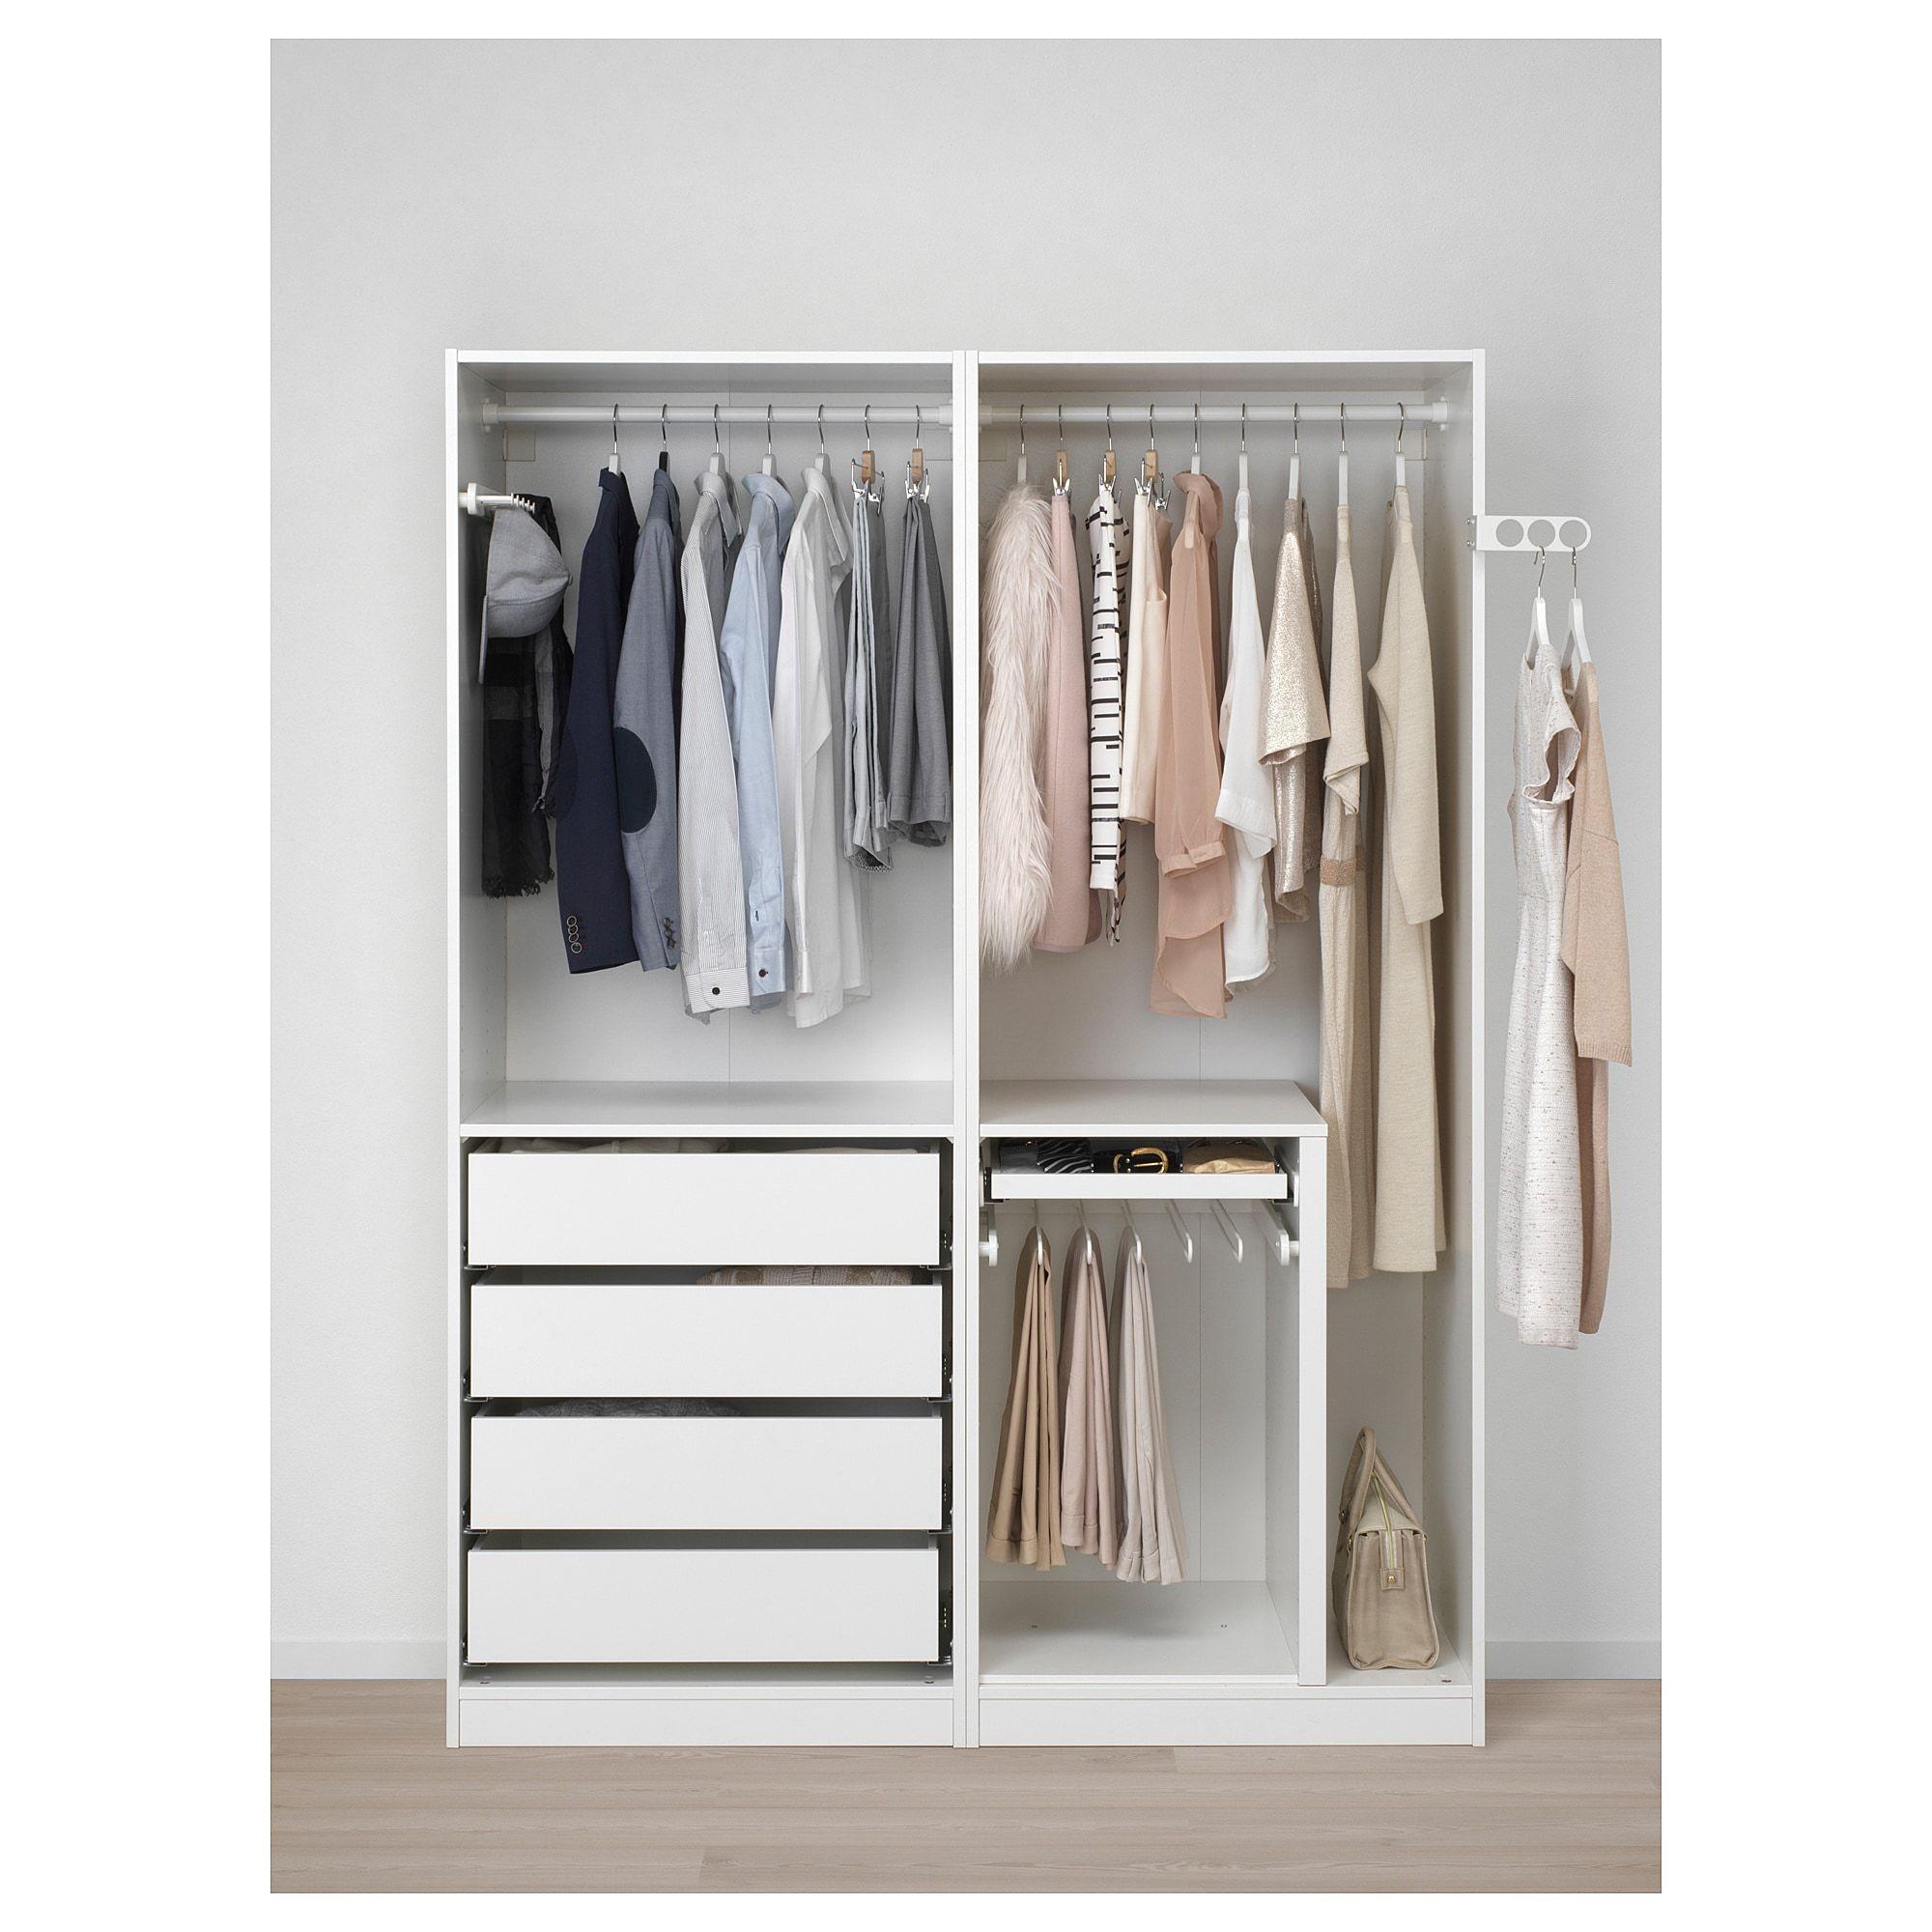 Ikea Pax White Wardrobe Apartments In 2019 Ikea Wardrobe